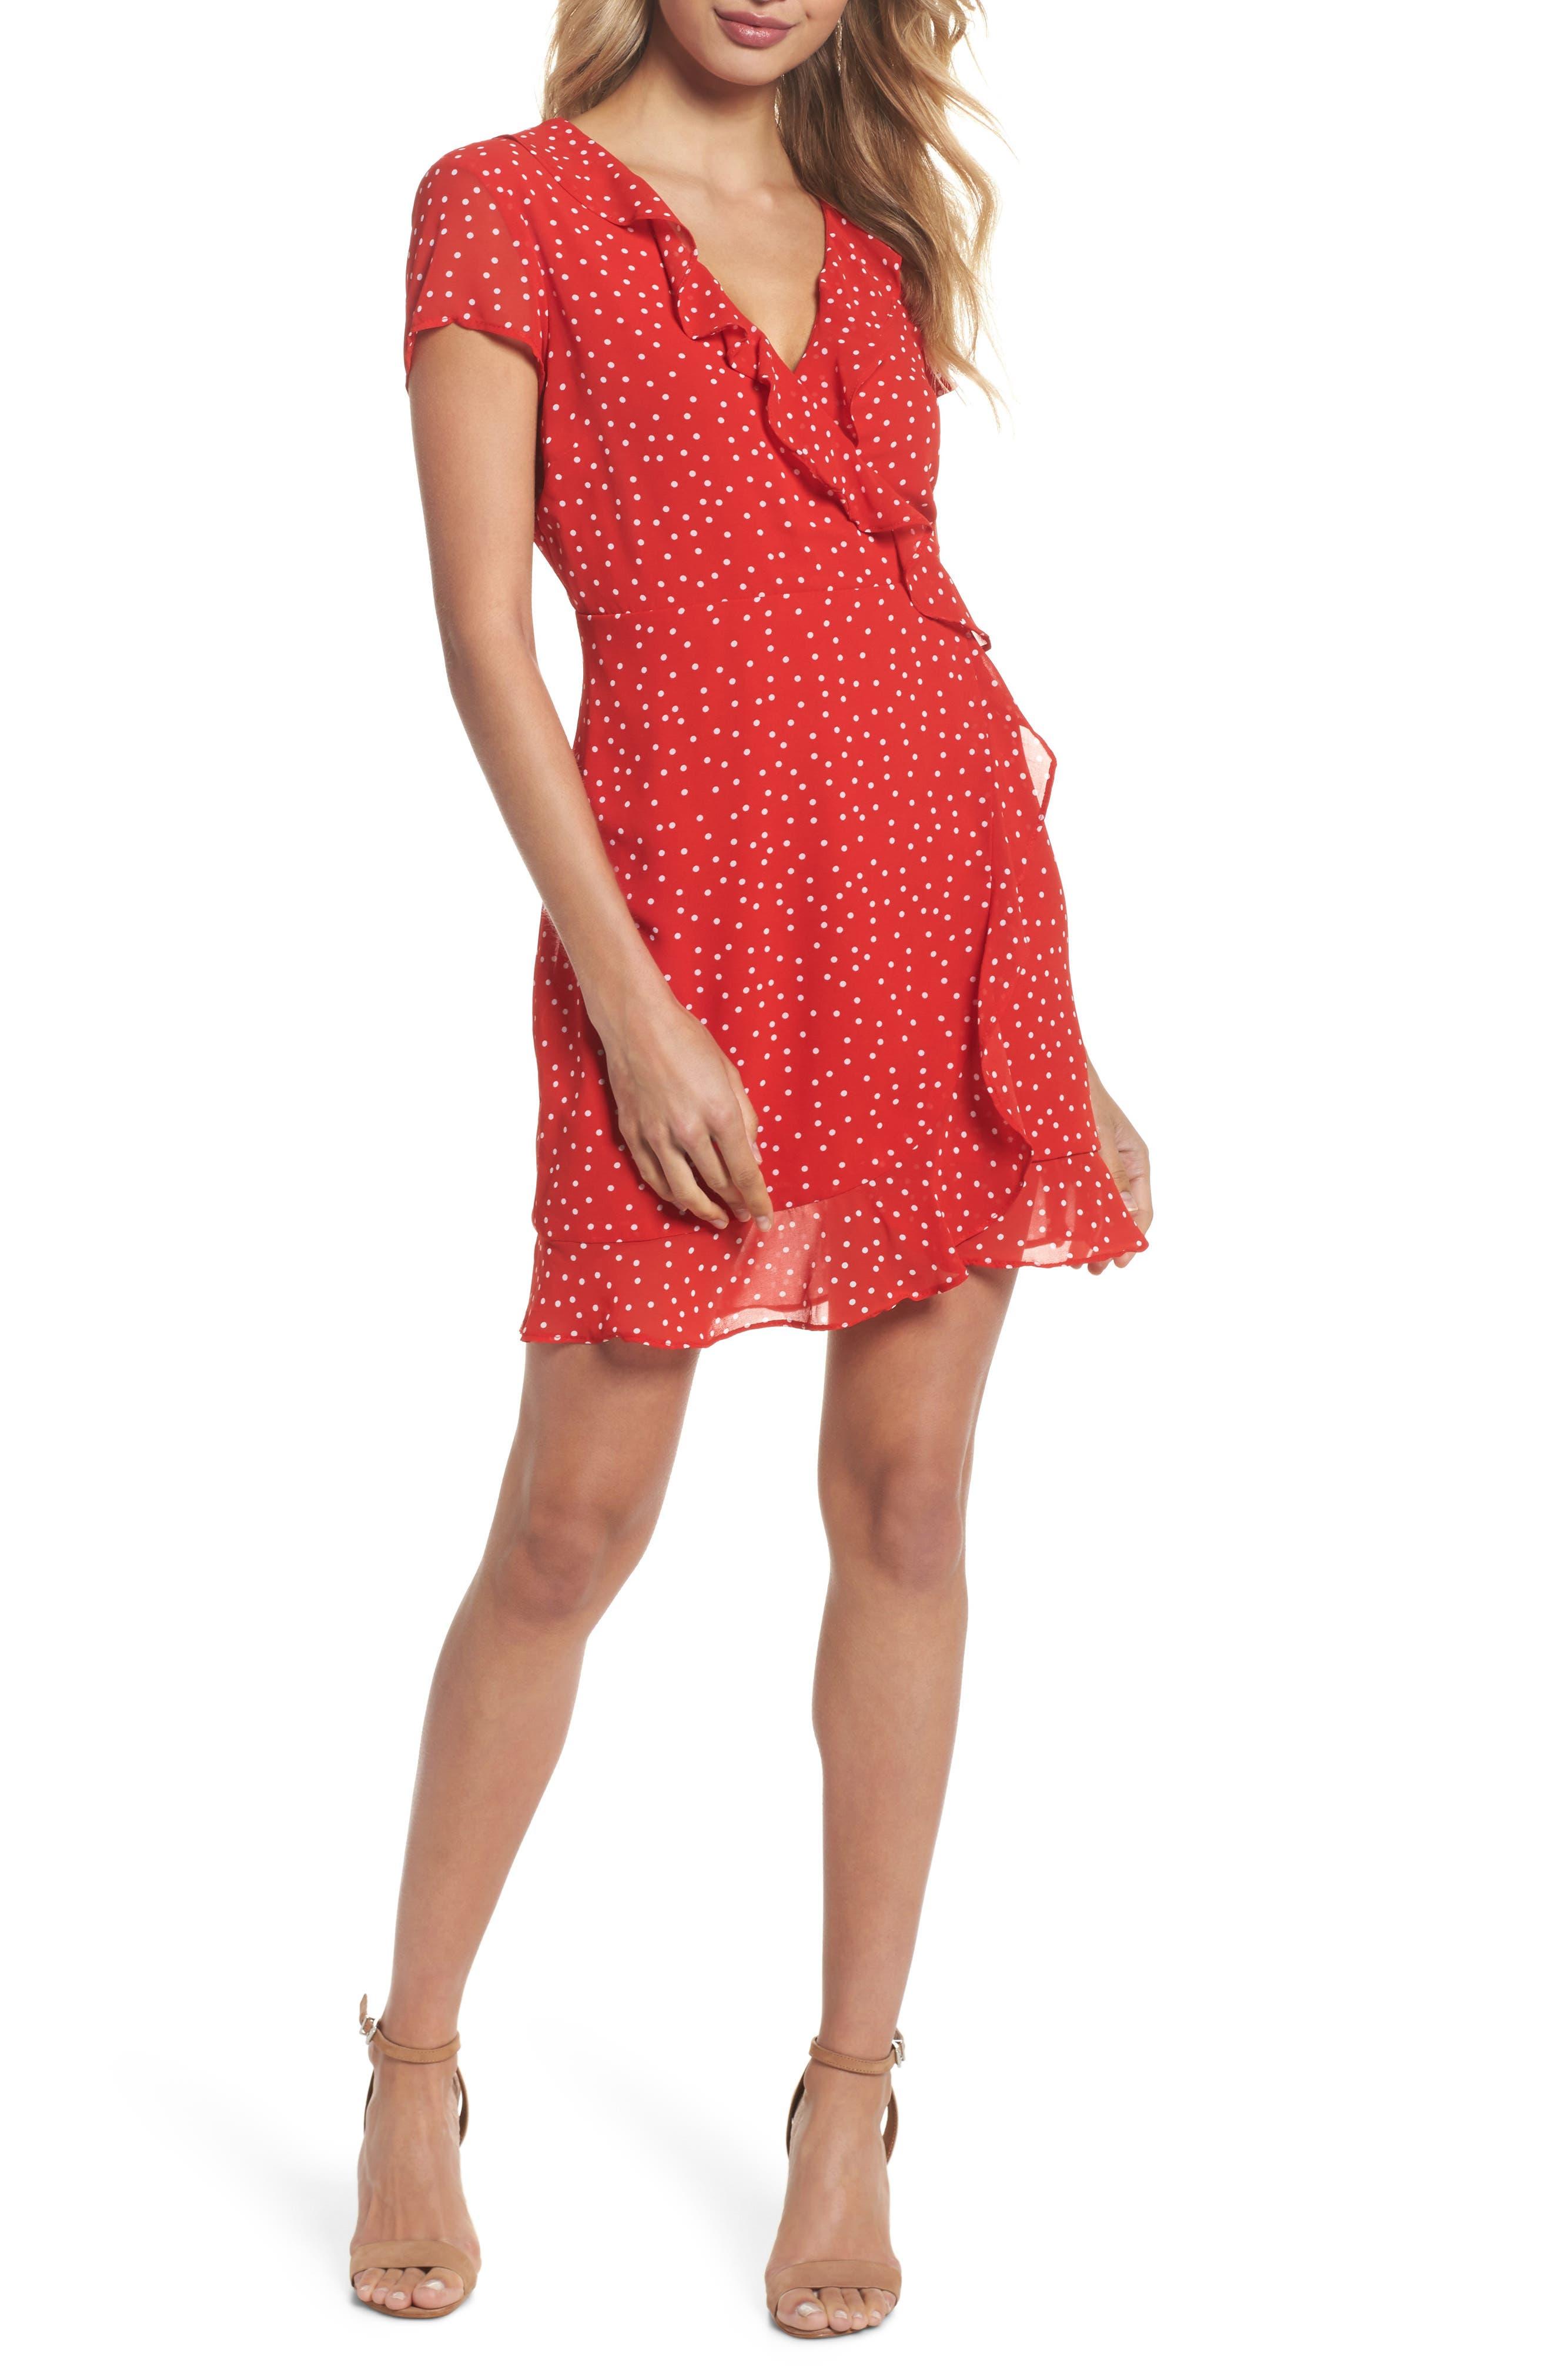 Main Image - Bardot Polka Dot Ruffle Dress